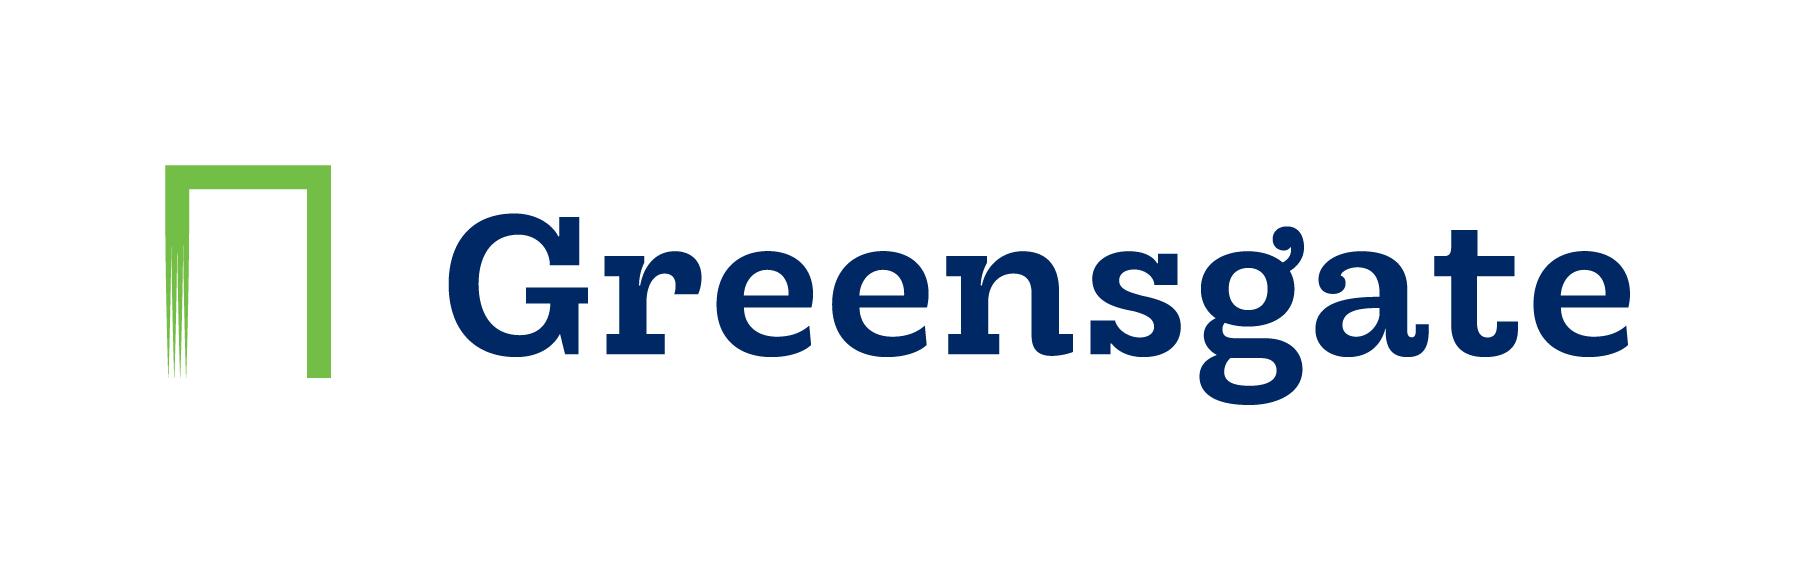 bm_greensgate_logo_rgb_left_color